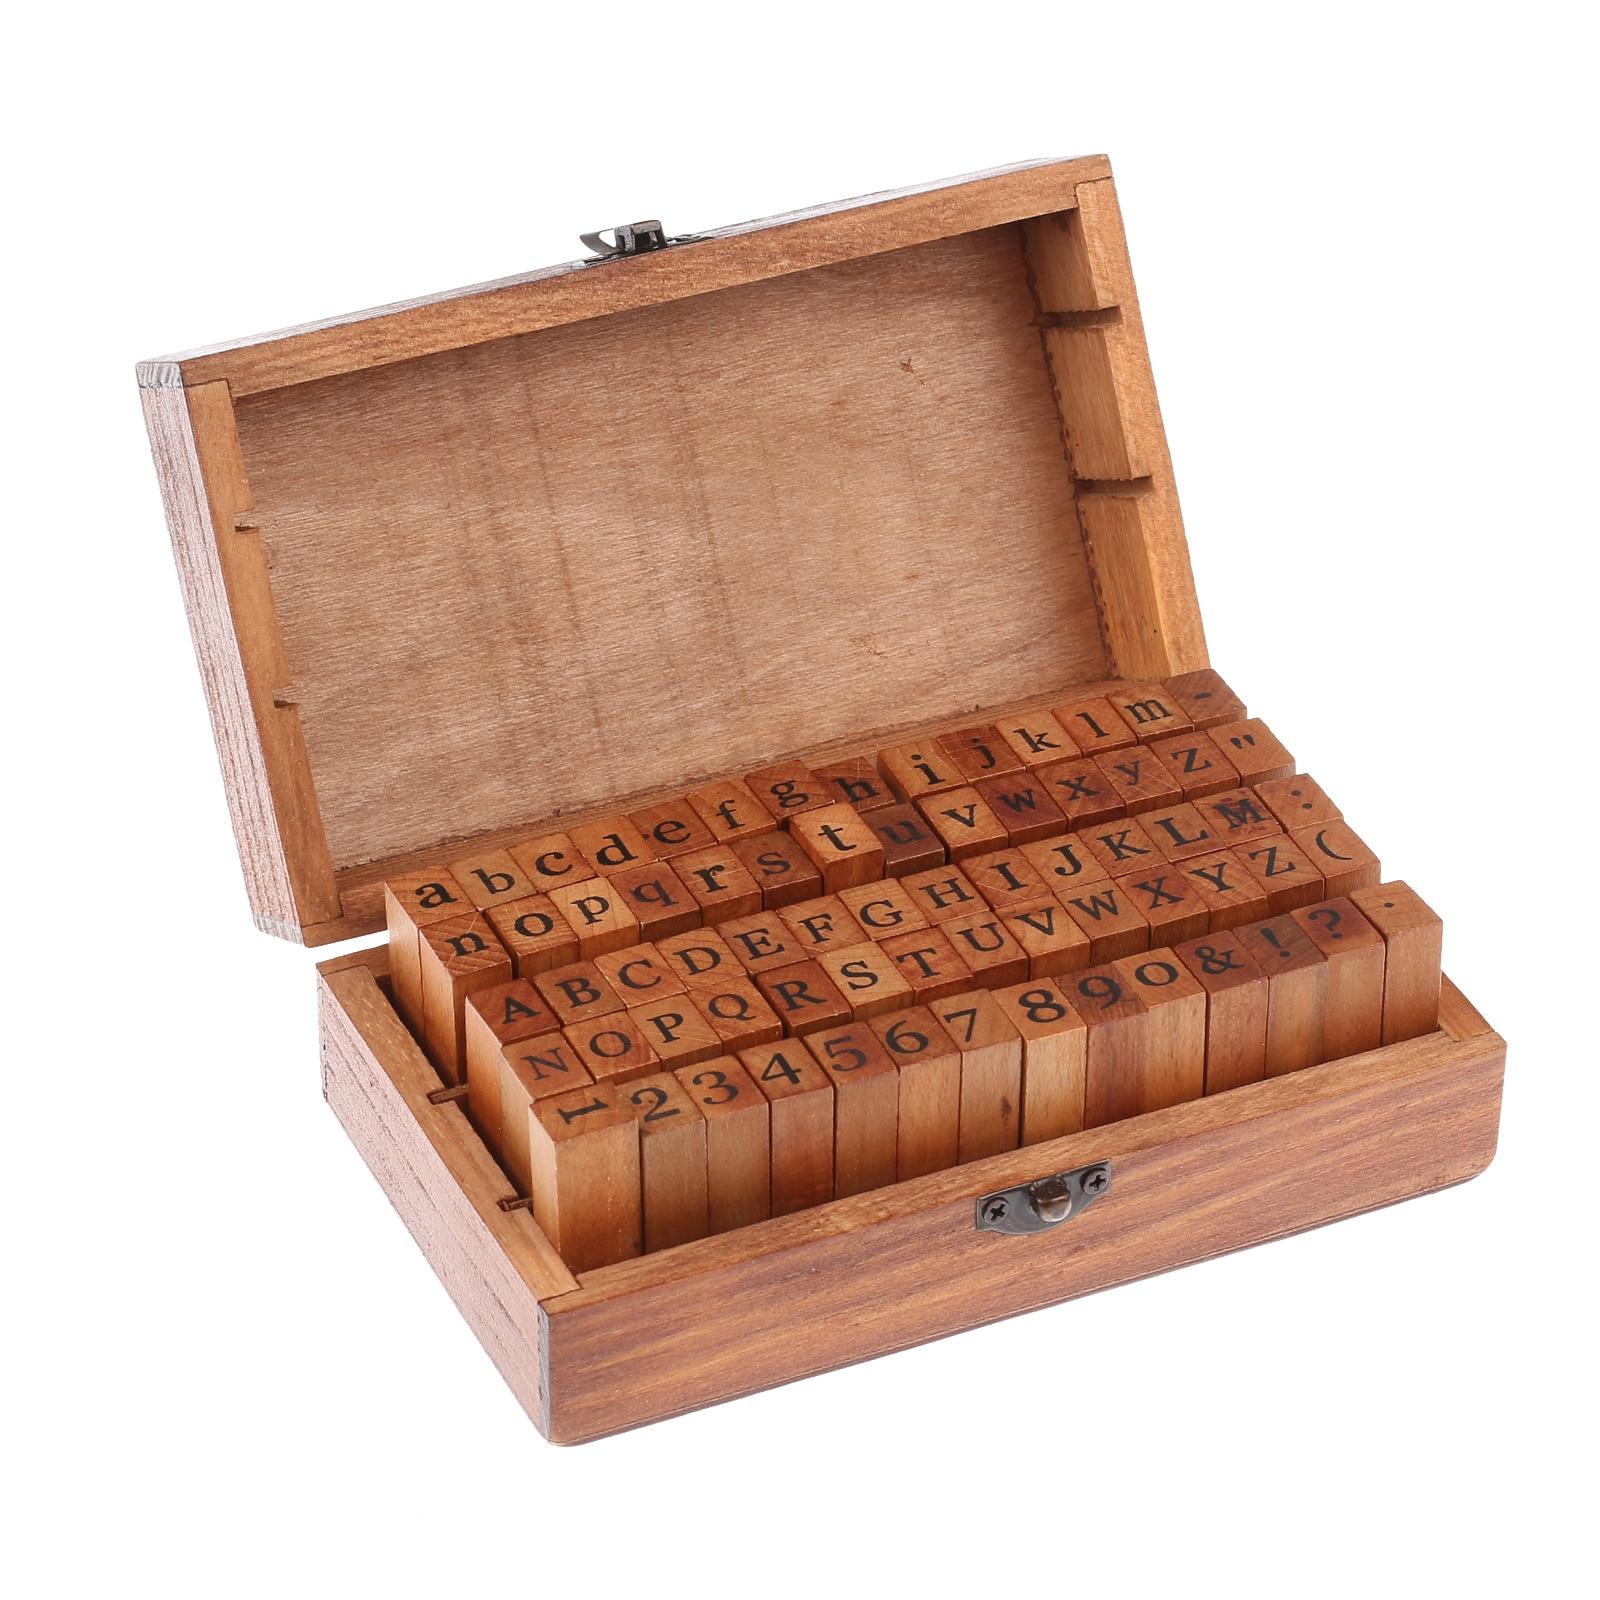 70 Pcs Letter Seal DIY Letter Alphabet Stamp Vintage Teach Wooden Alphabet And Number Stamps Set With Dark Brown Wooden Box